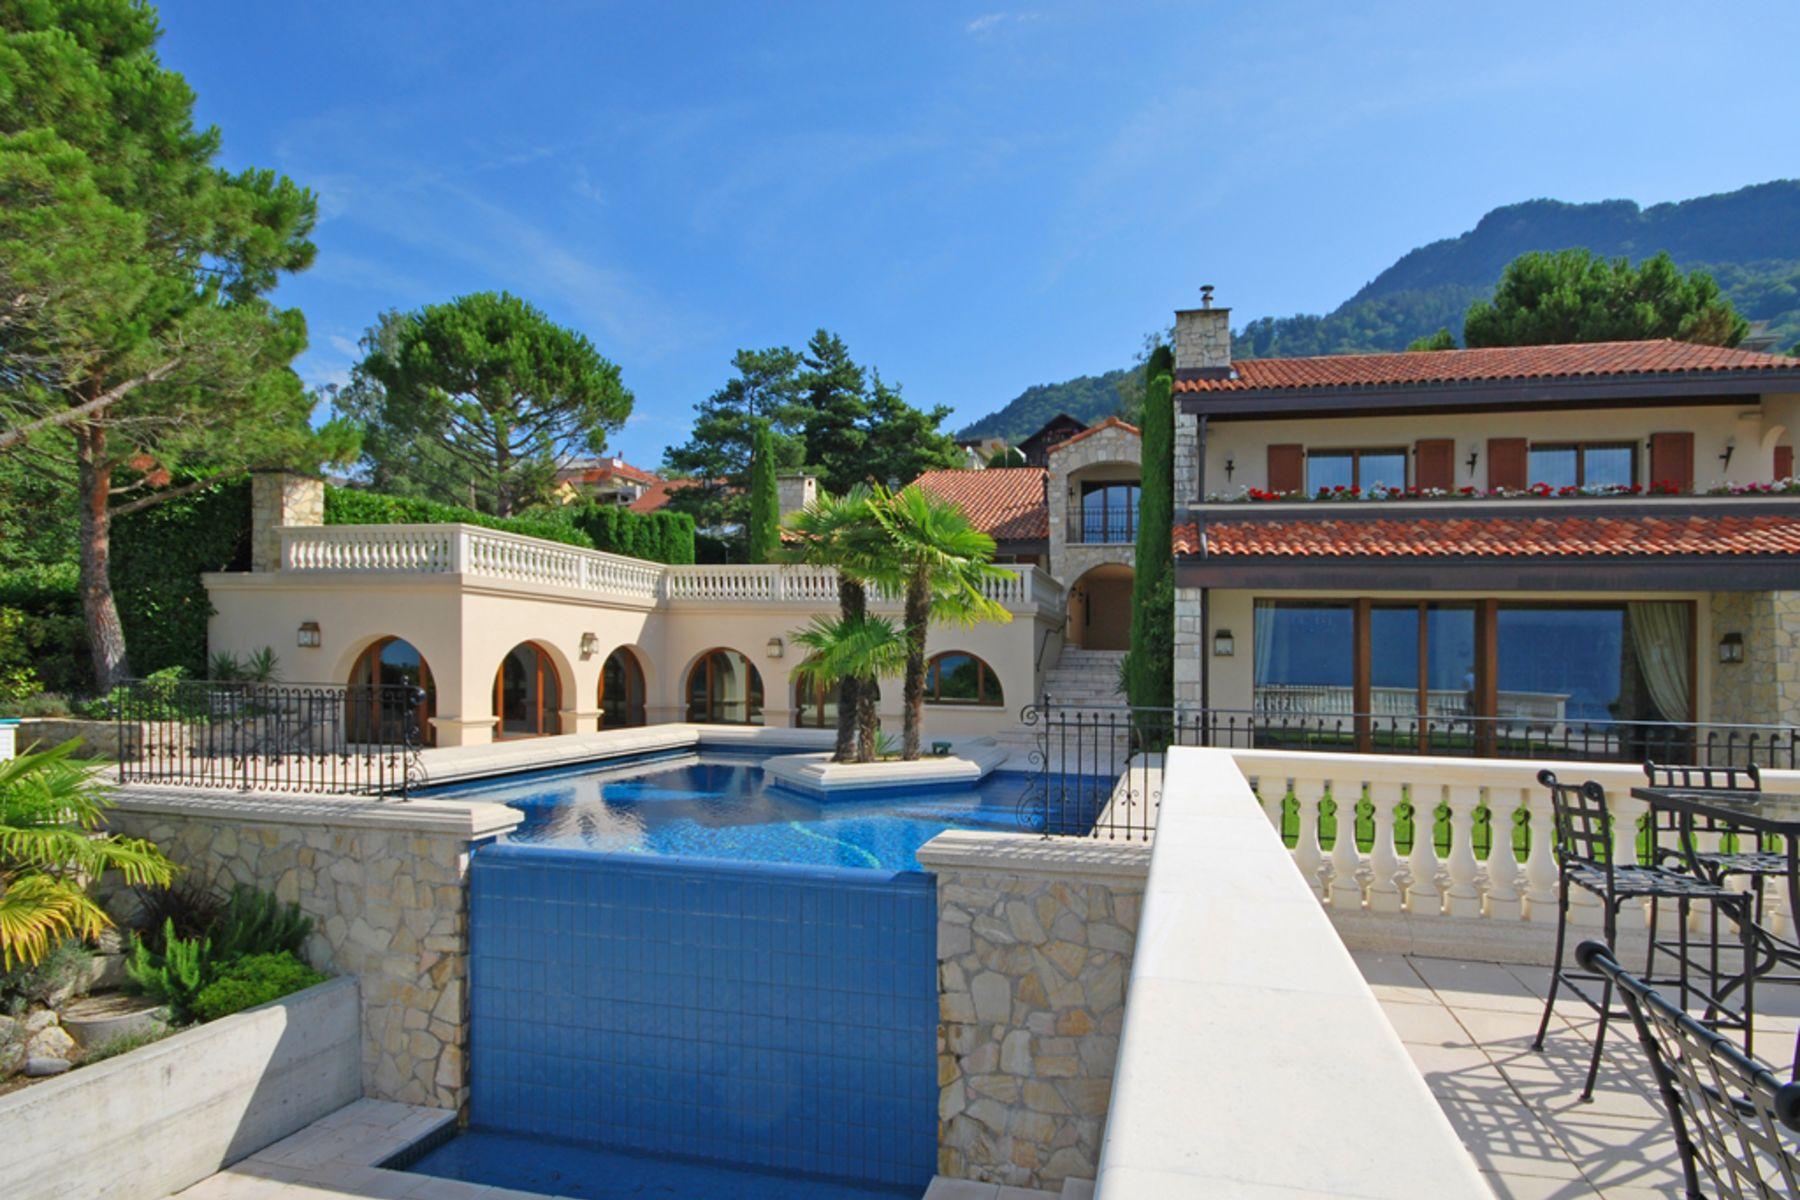 独户住宅 为 销售 在 Exceptional property with uninterrupted views Chernex/Montreux 蒙特勒, 沃州, 1820 瑞士